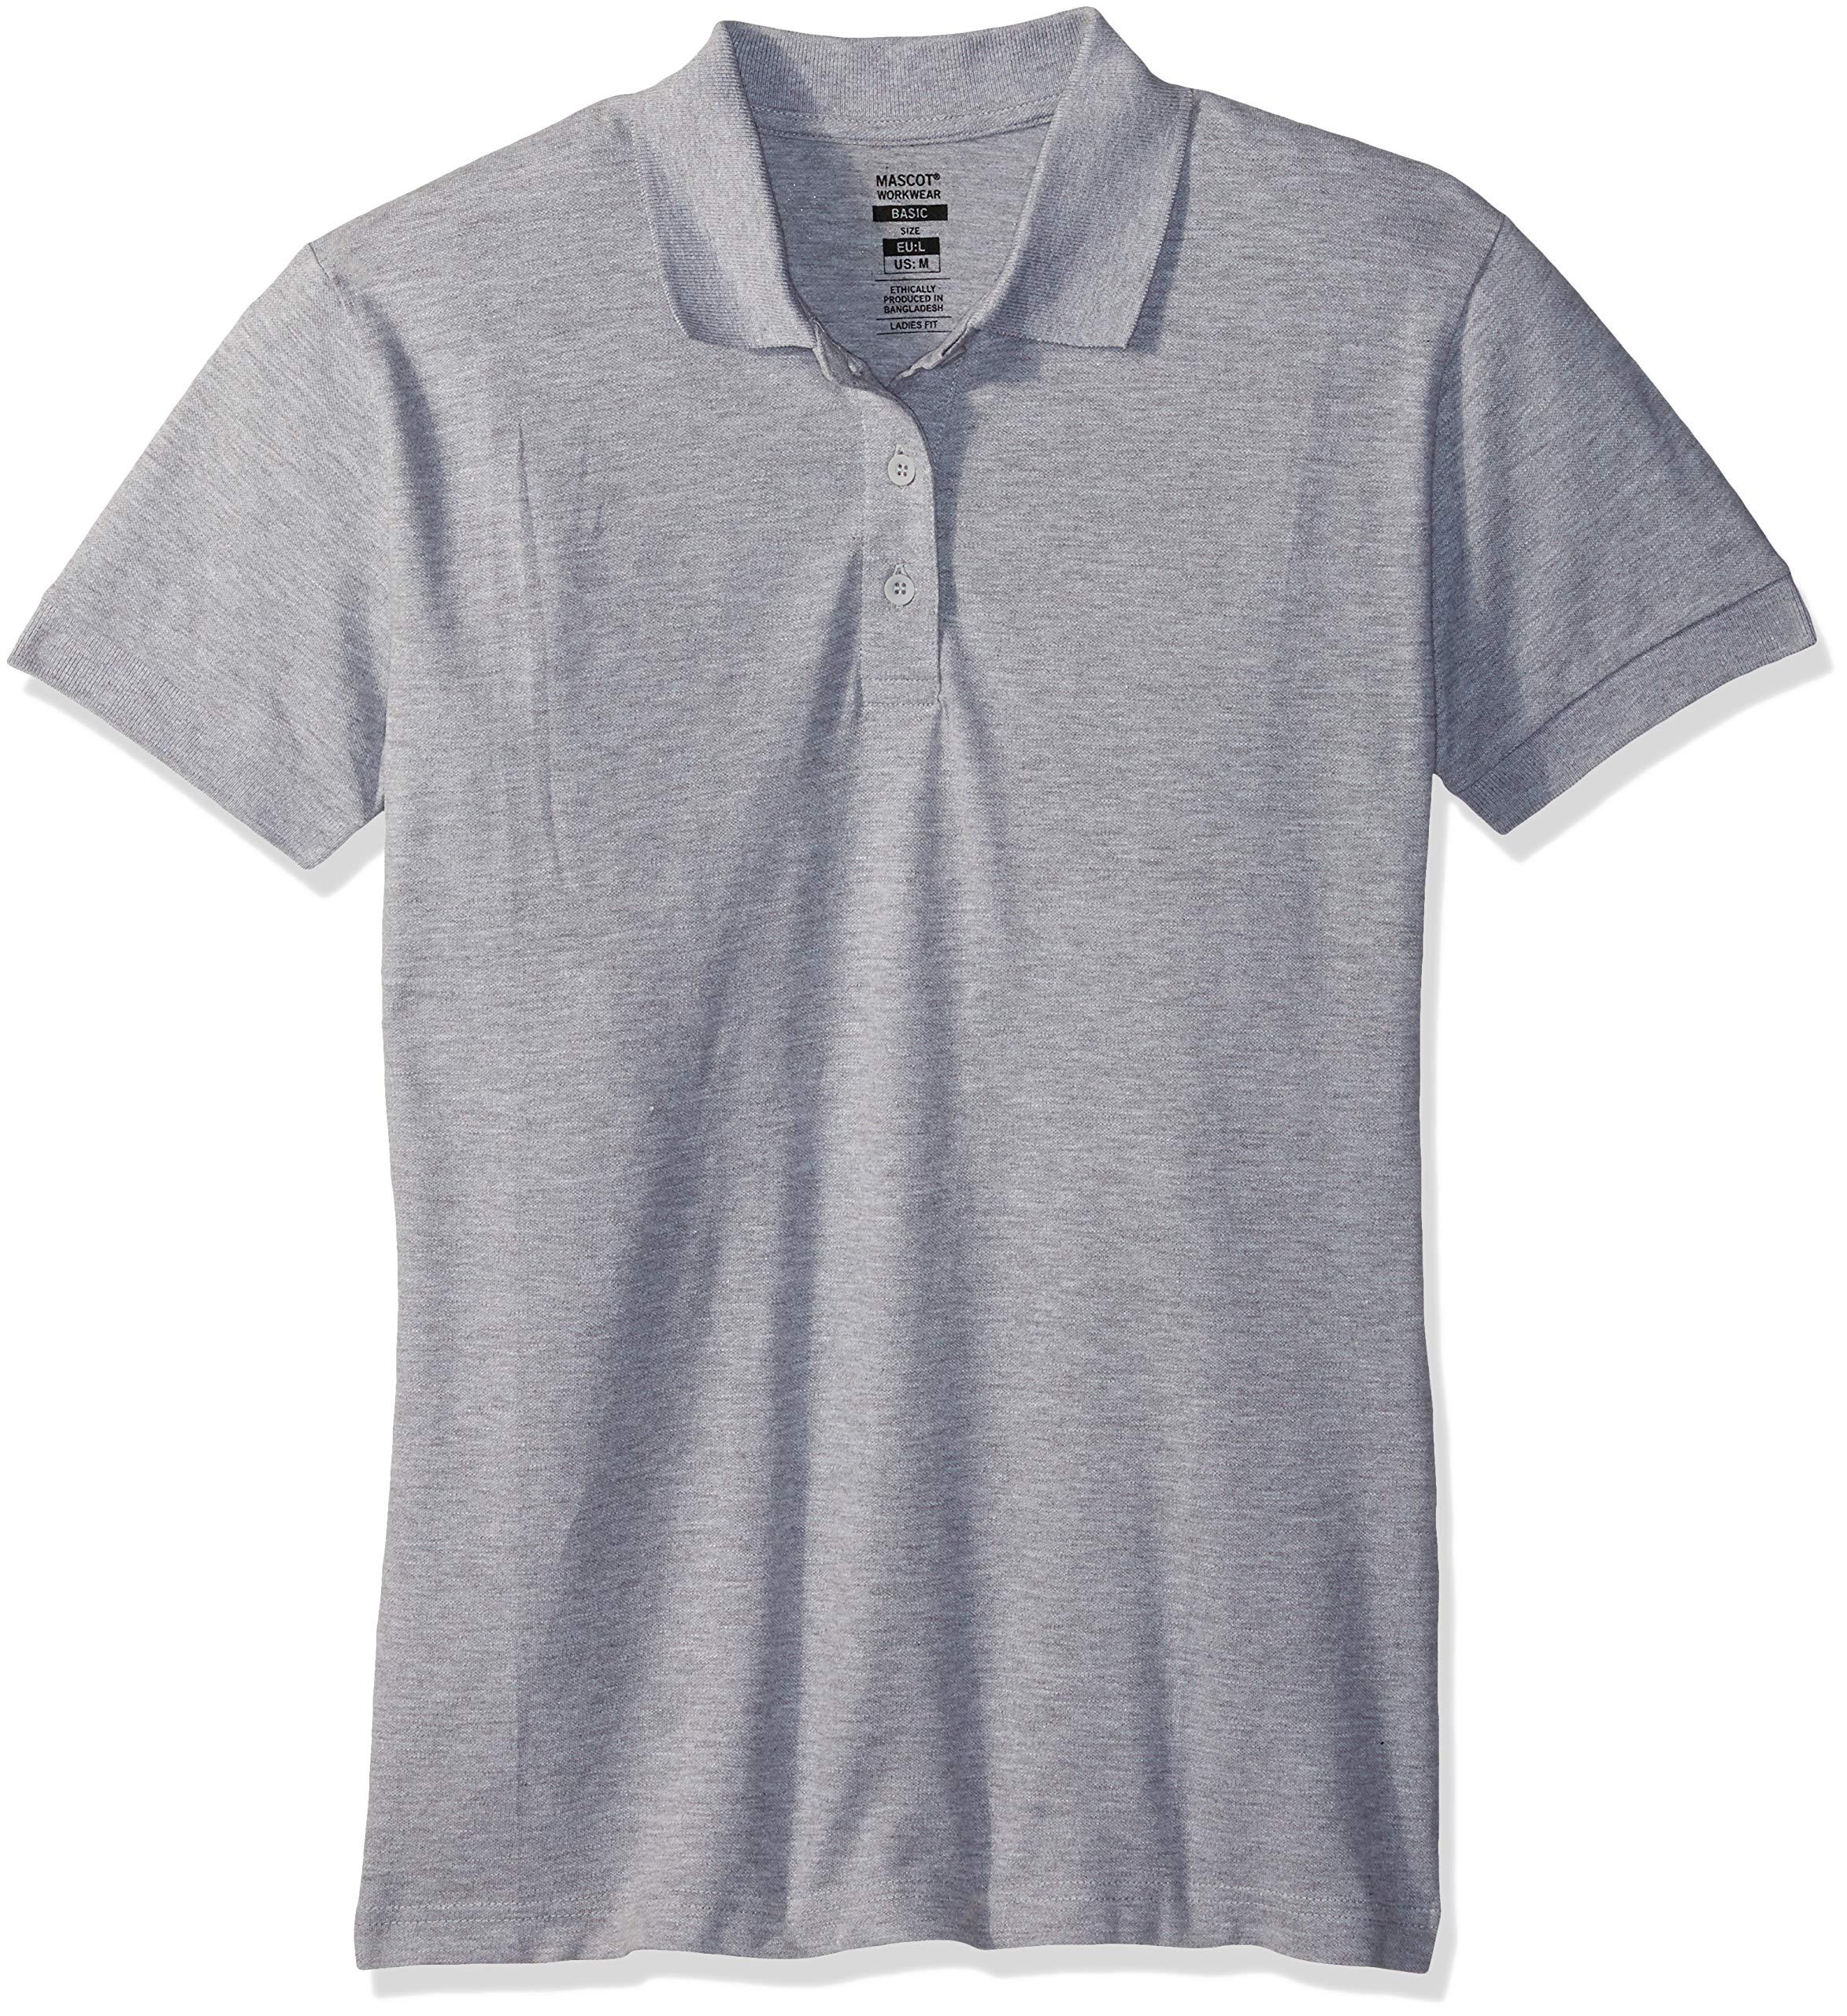 Mascot 51588-969-08-L Woman-Poloshirt''Grasse'' Size L, Grey-Flecked